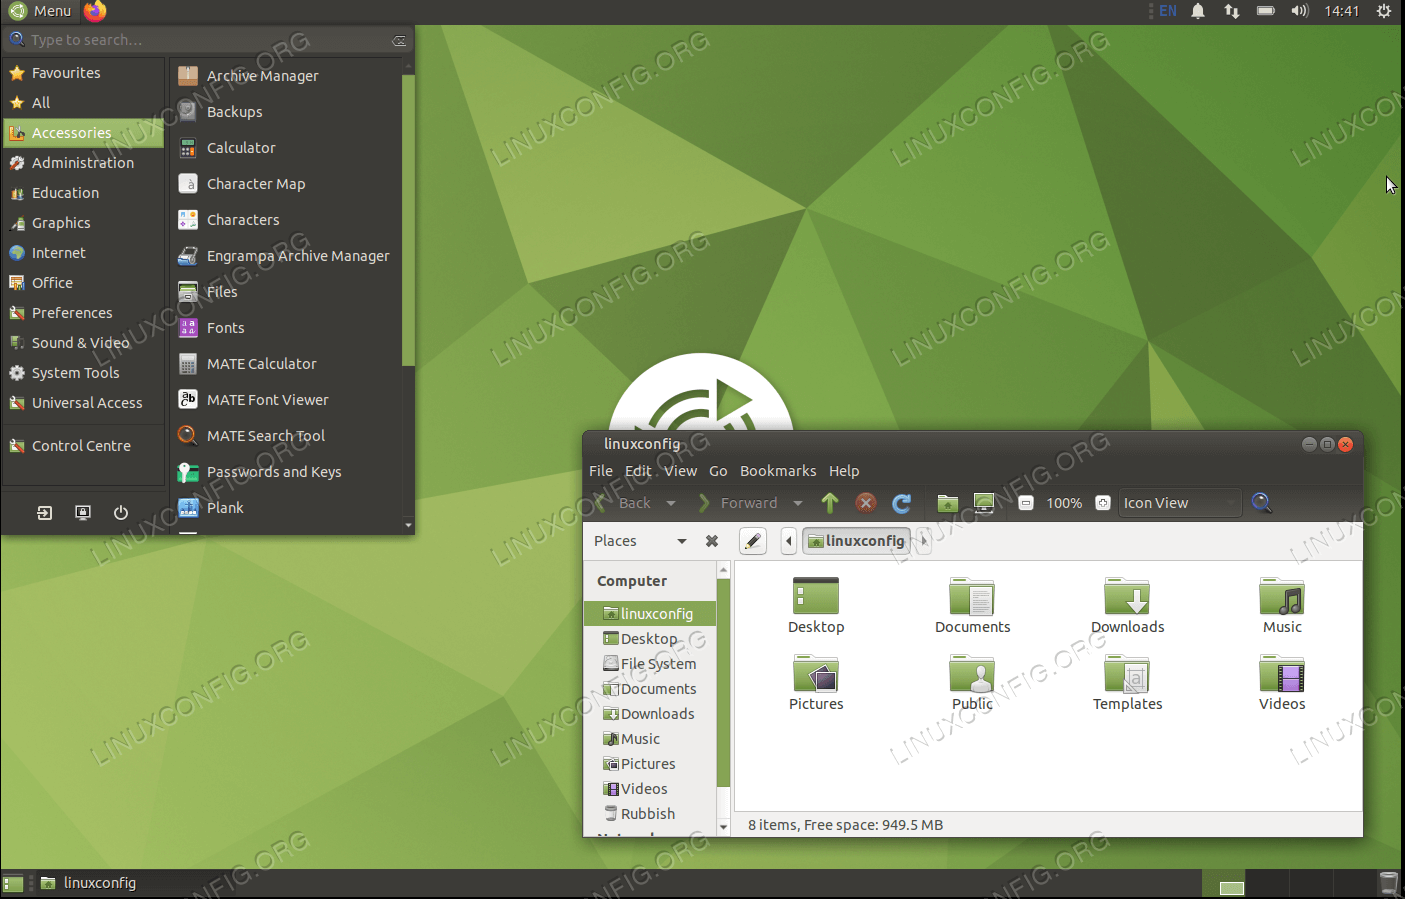 MATE desktop on Ubuntu 20.04 Focal Fossa Linux